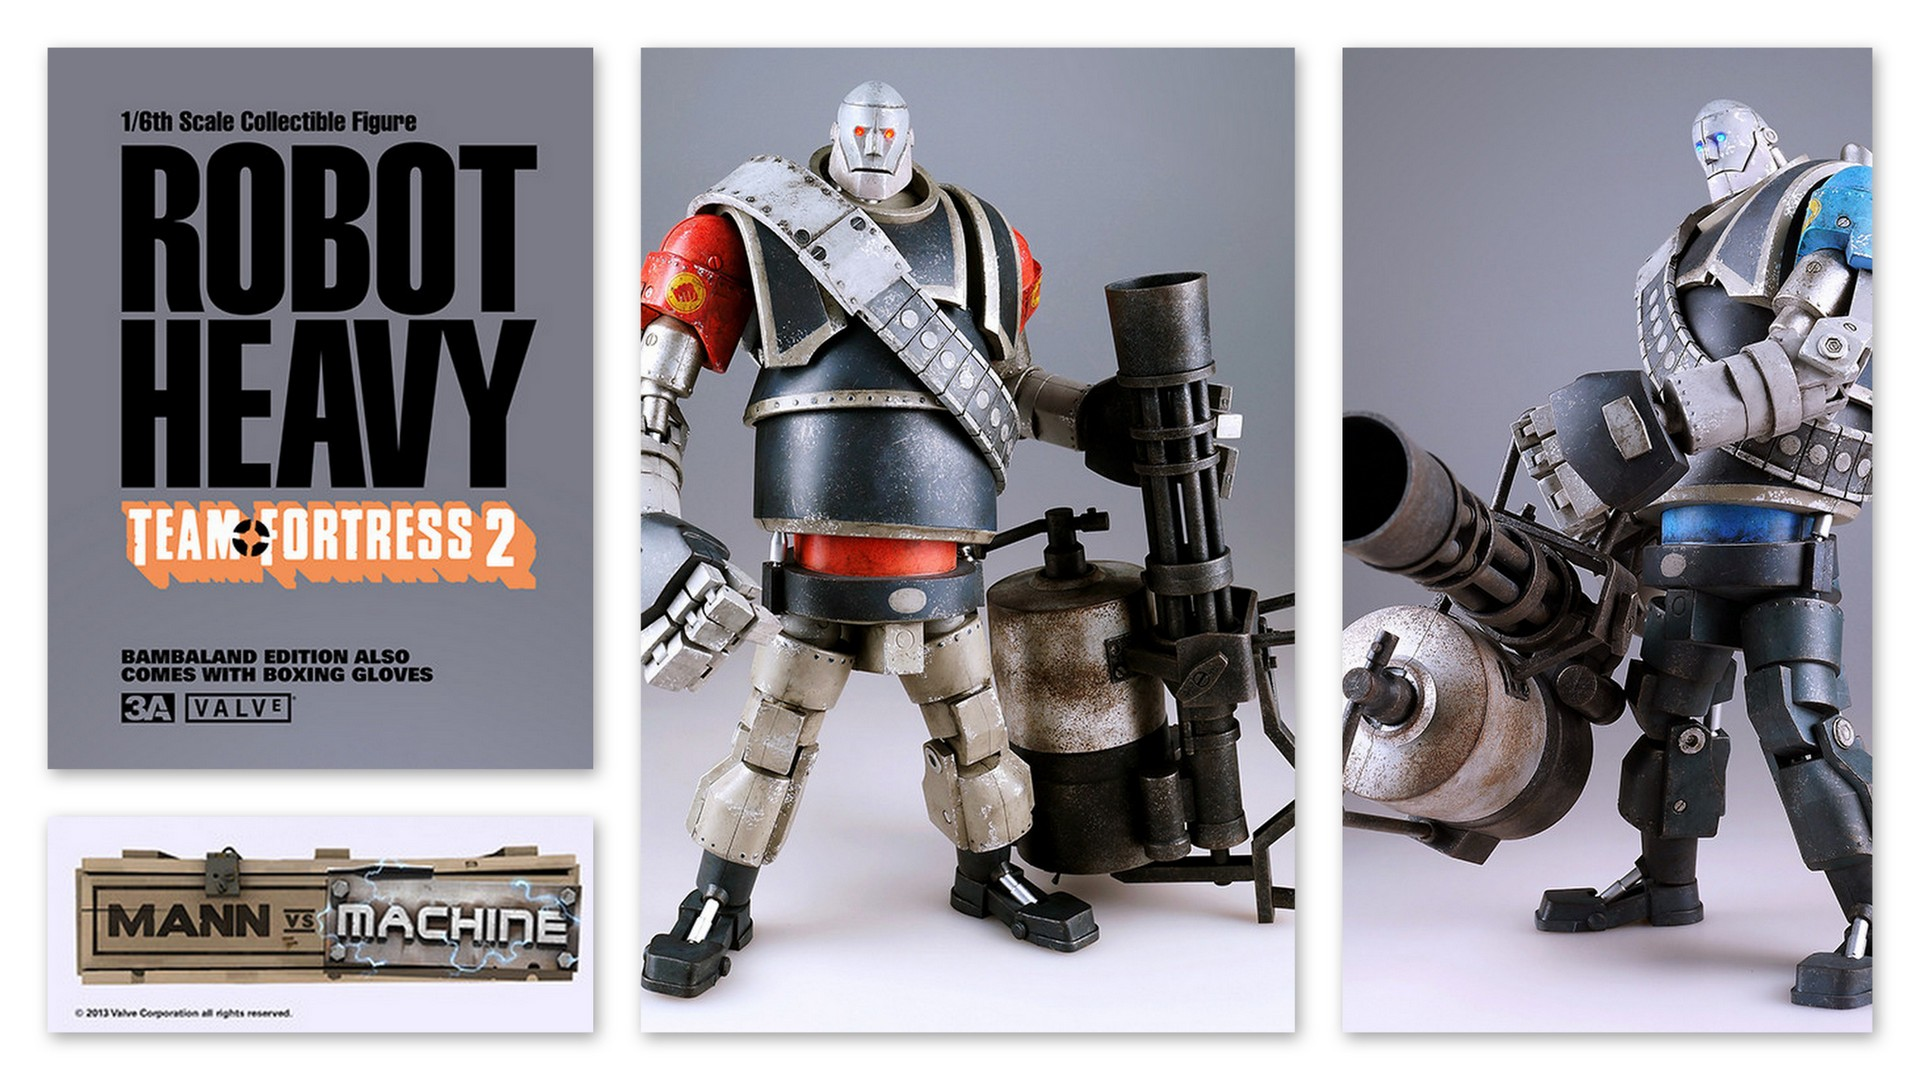 tf2 mann vs machine robots